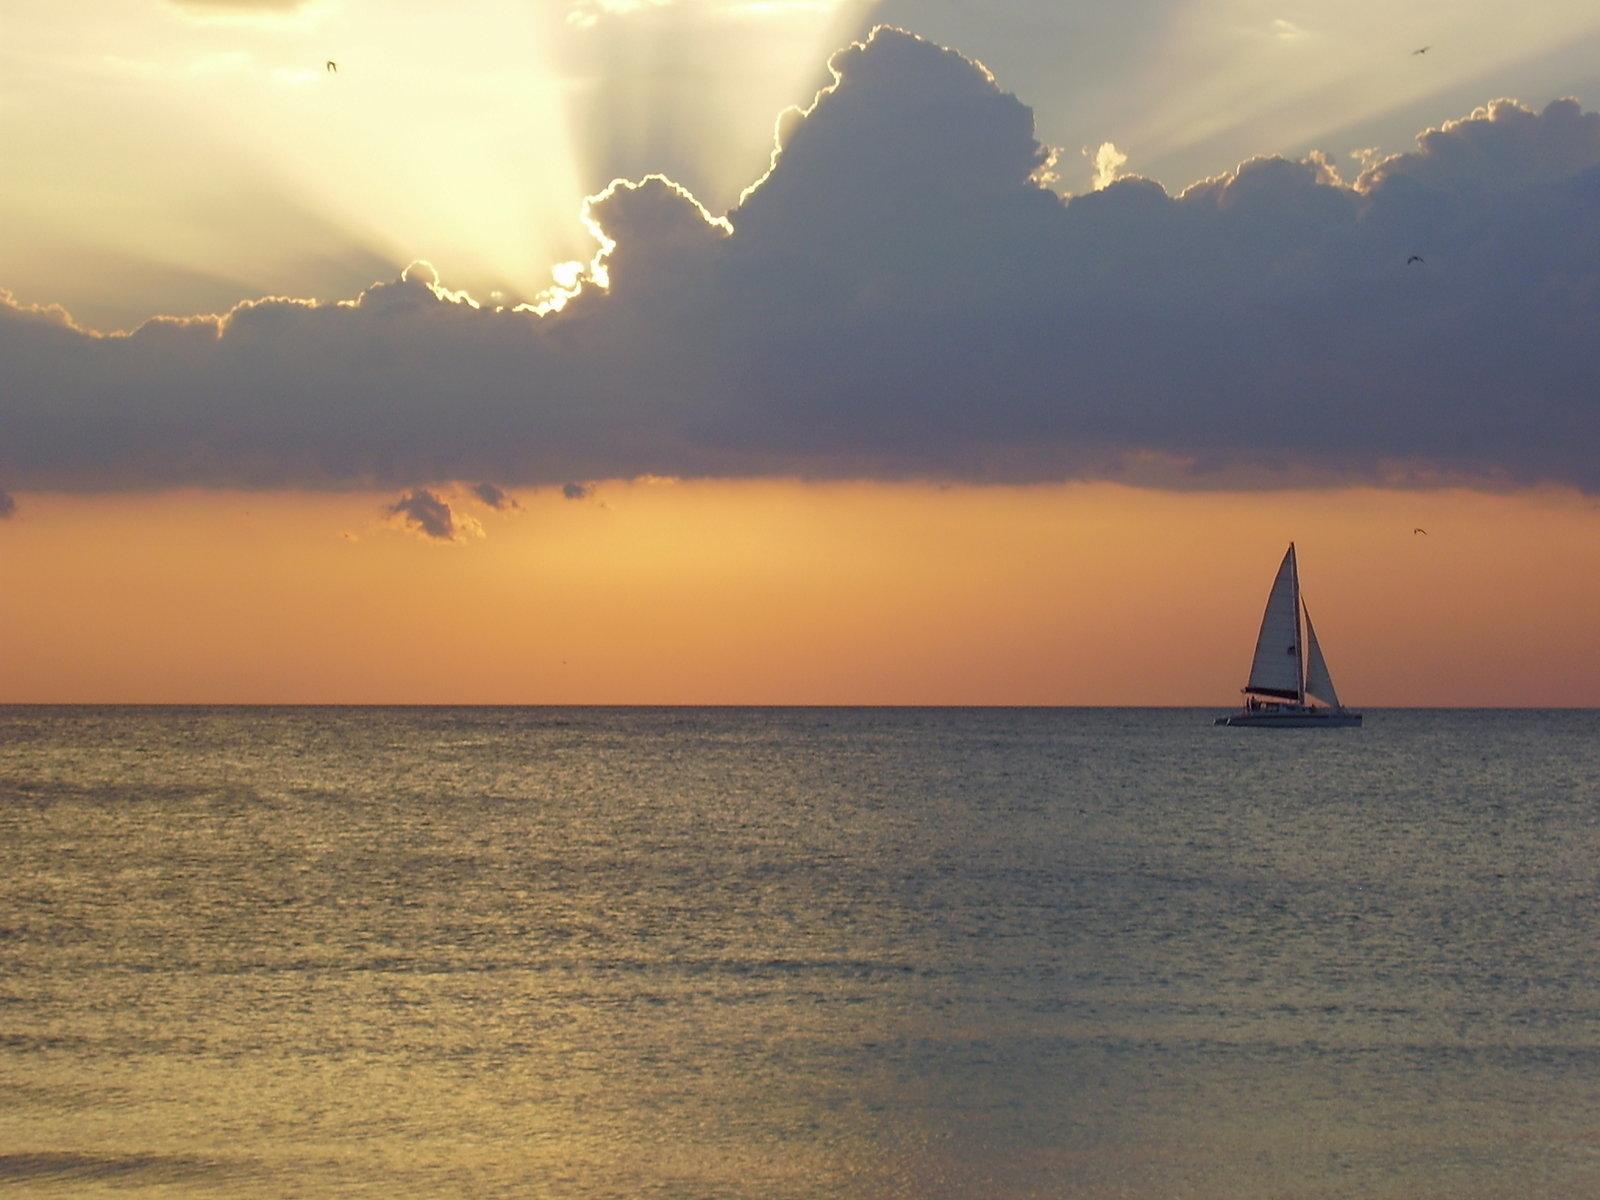 sunset-1399937-1600x1200